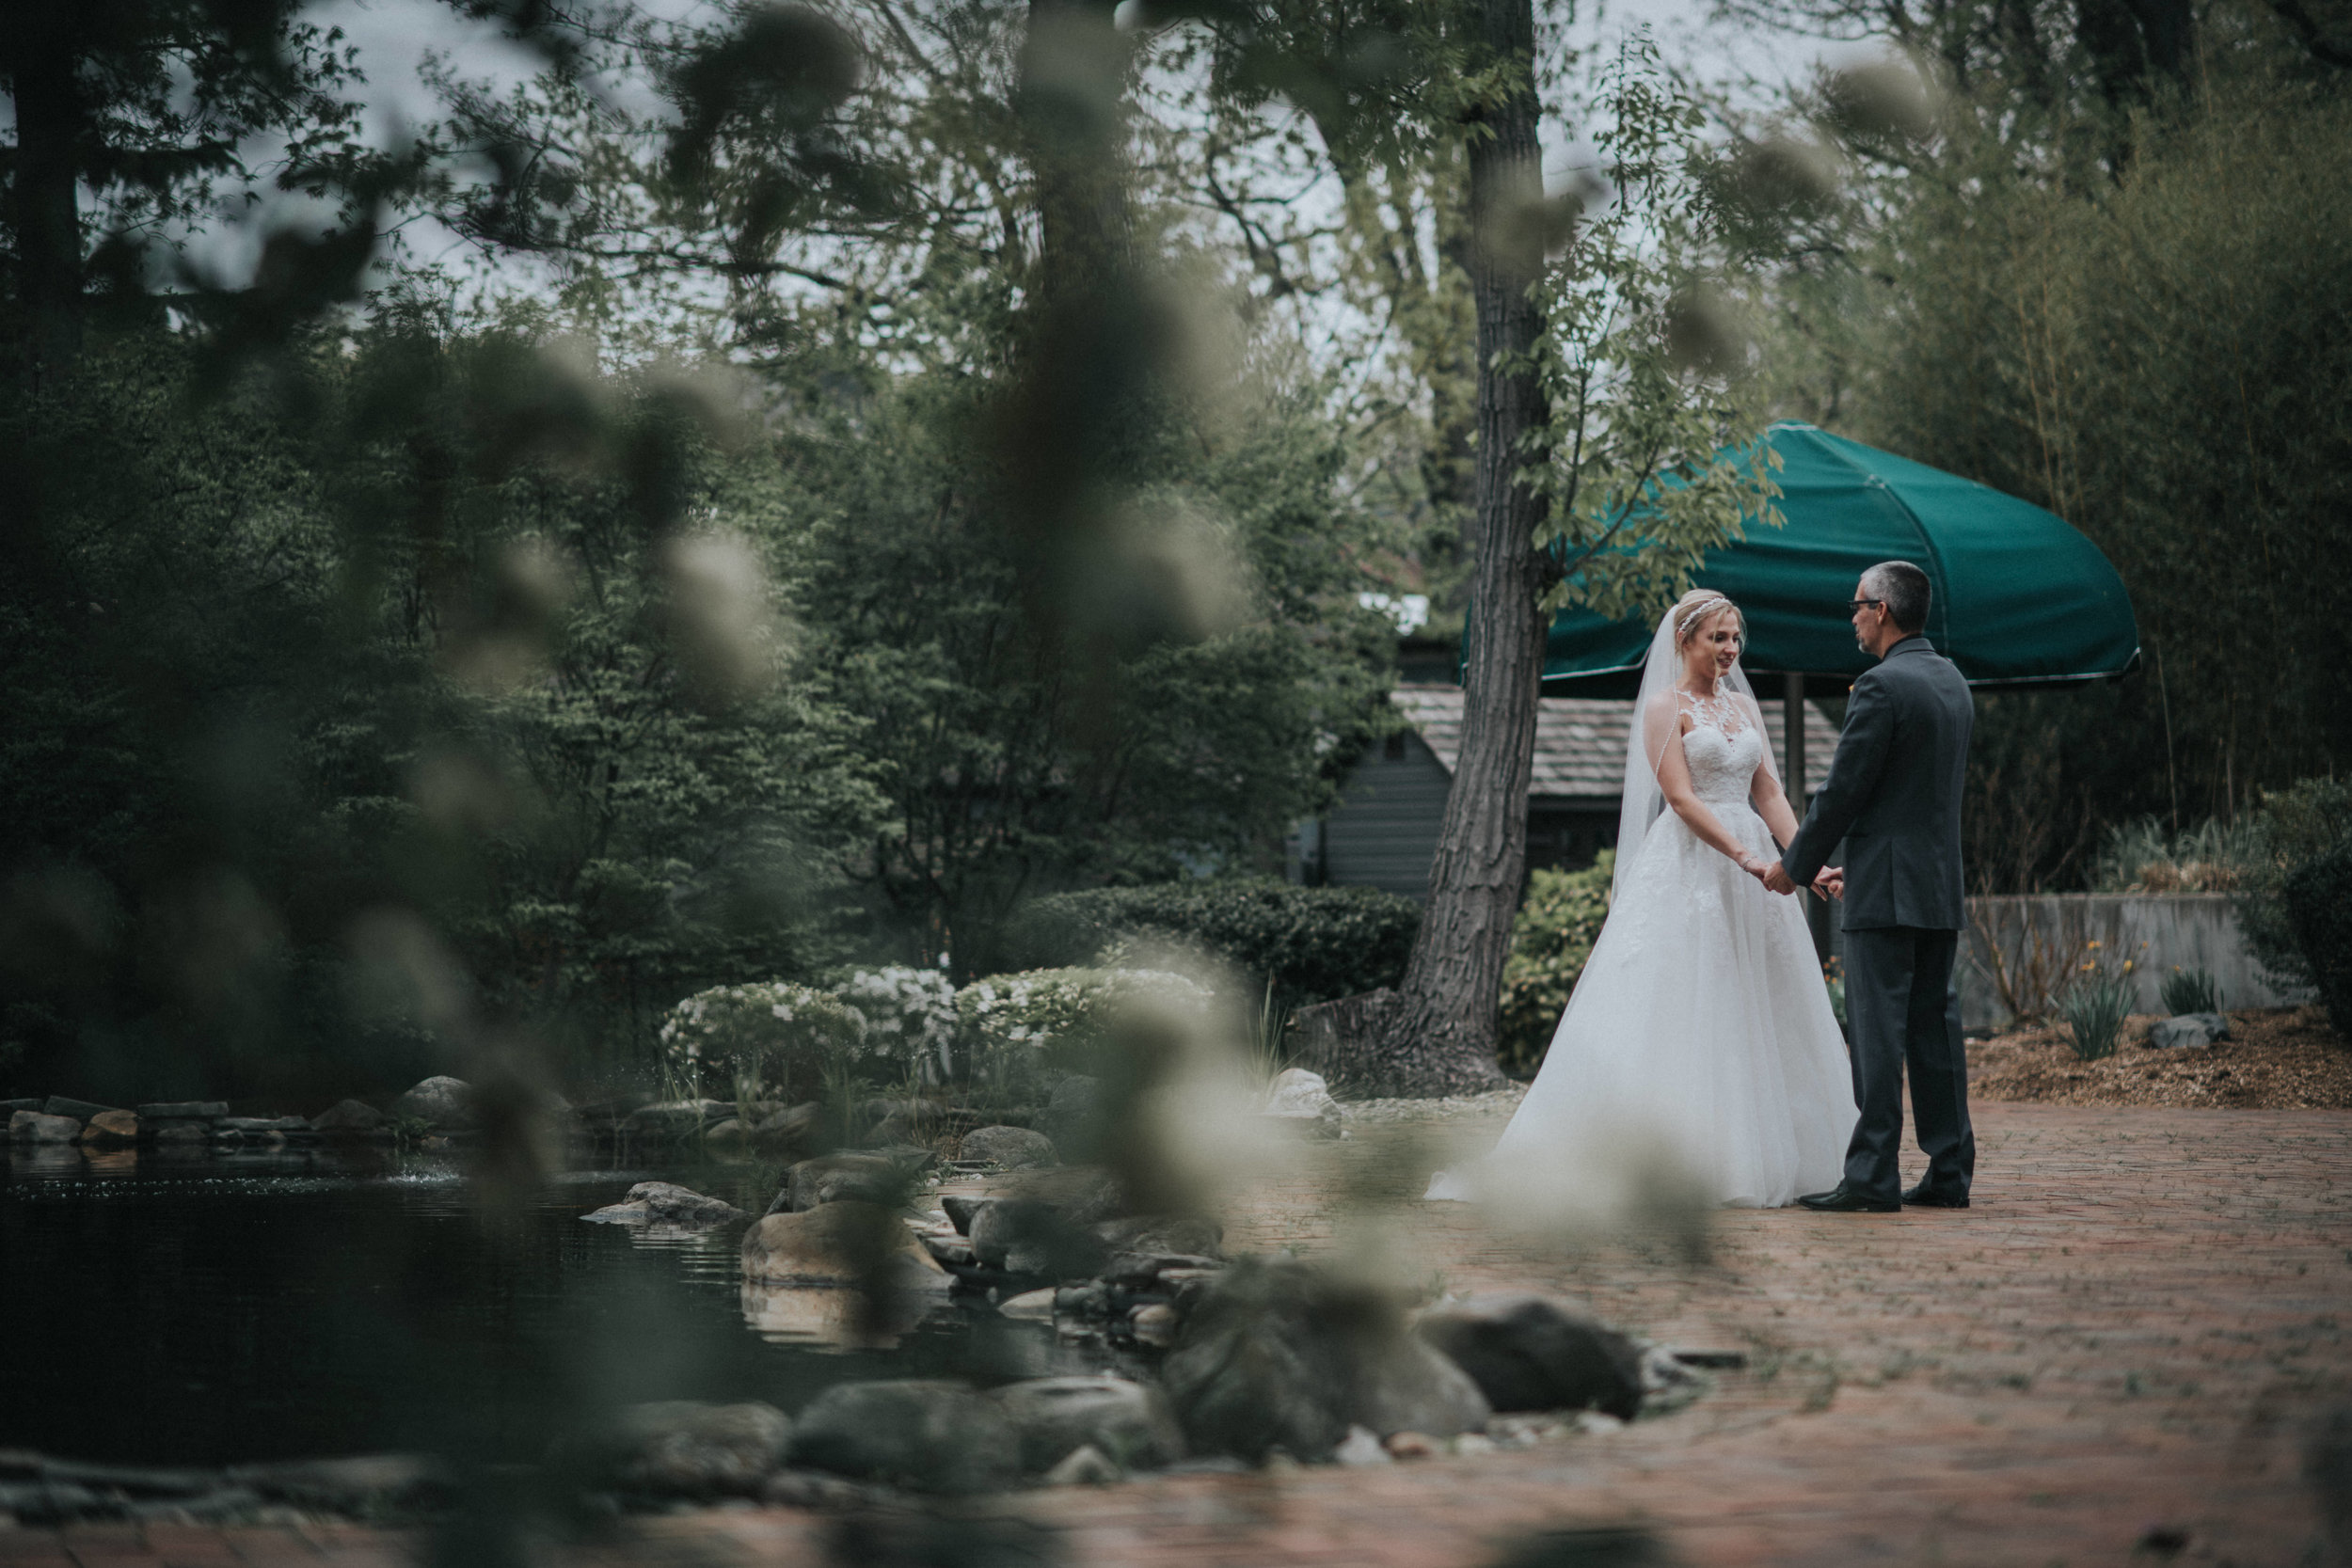 New-Jersey-Wedding-Photographer-Megan&Nick-FirstLooks-19.jpg